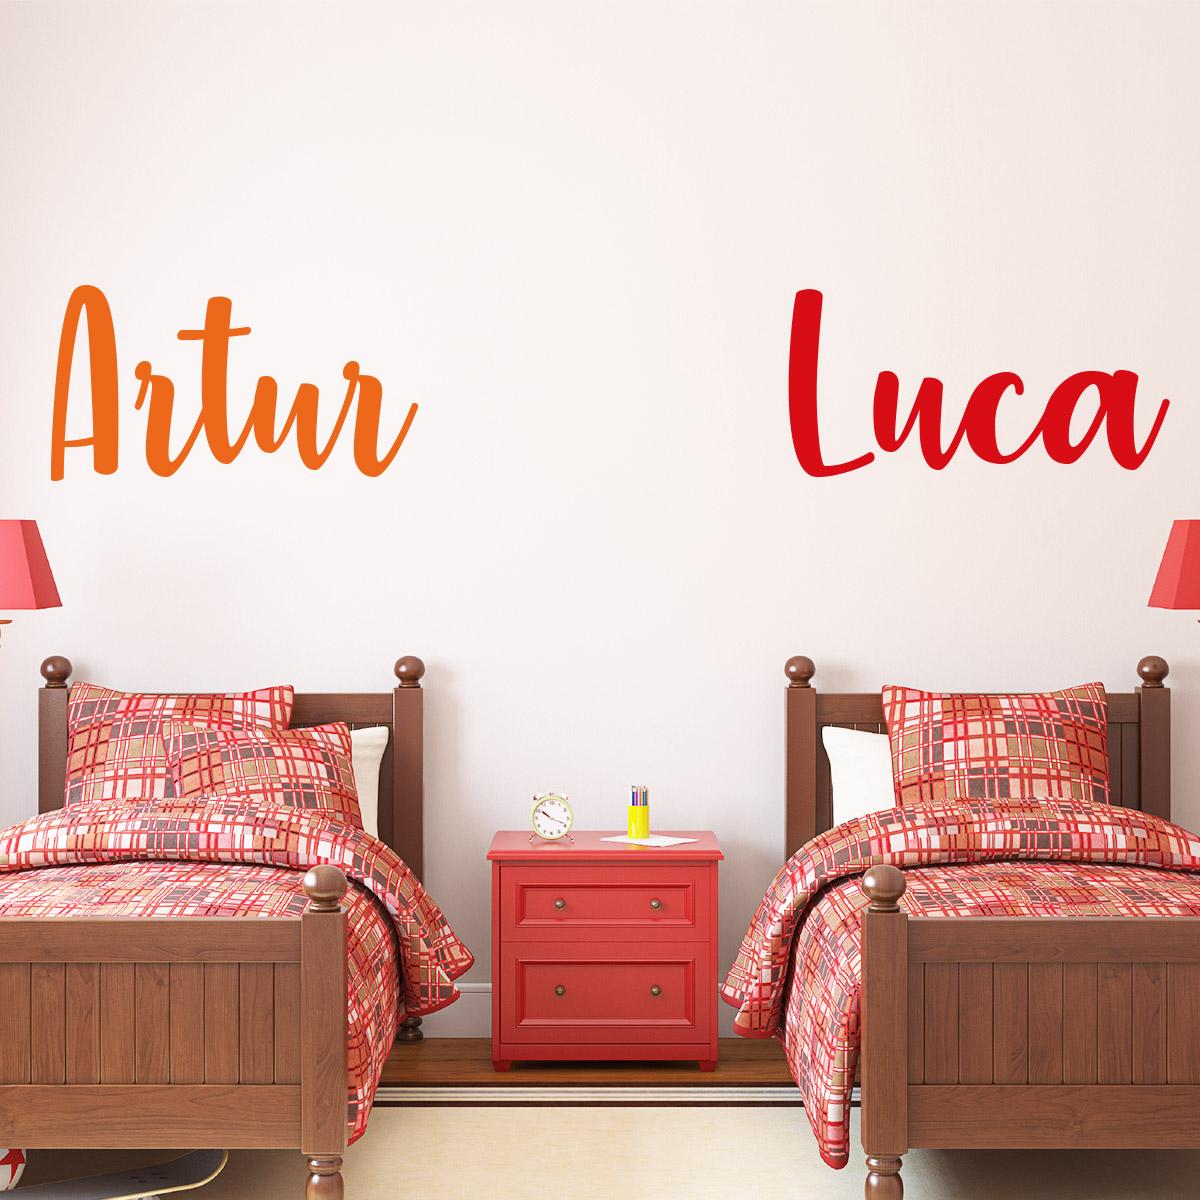 sticker pr nom personnalisable manuscrit chouette. Black Bedroom Furniture Sets. Home Design Ideas